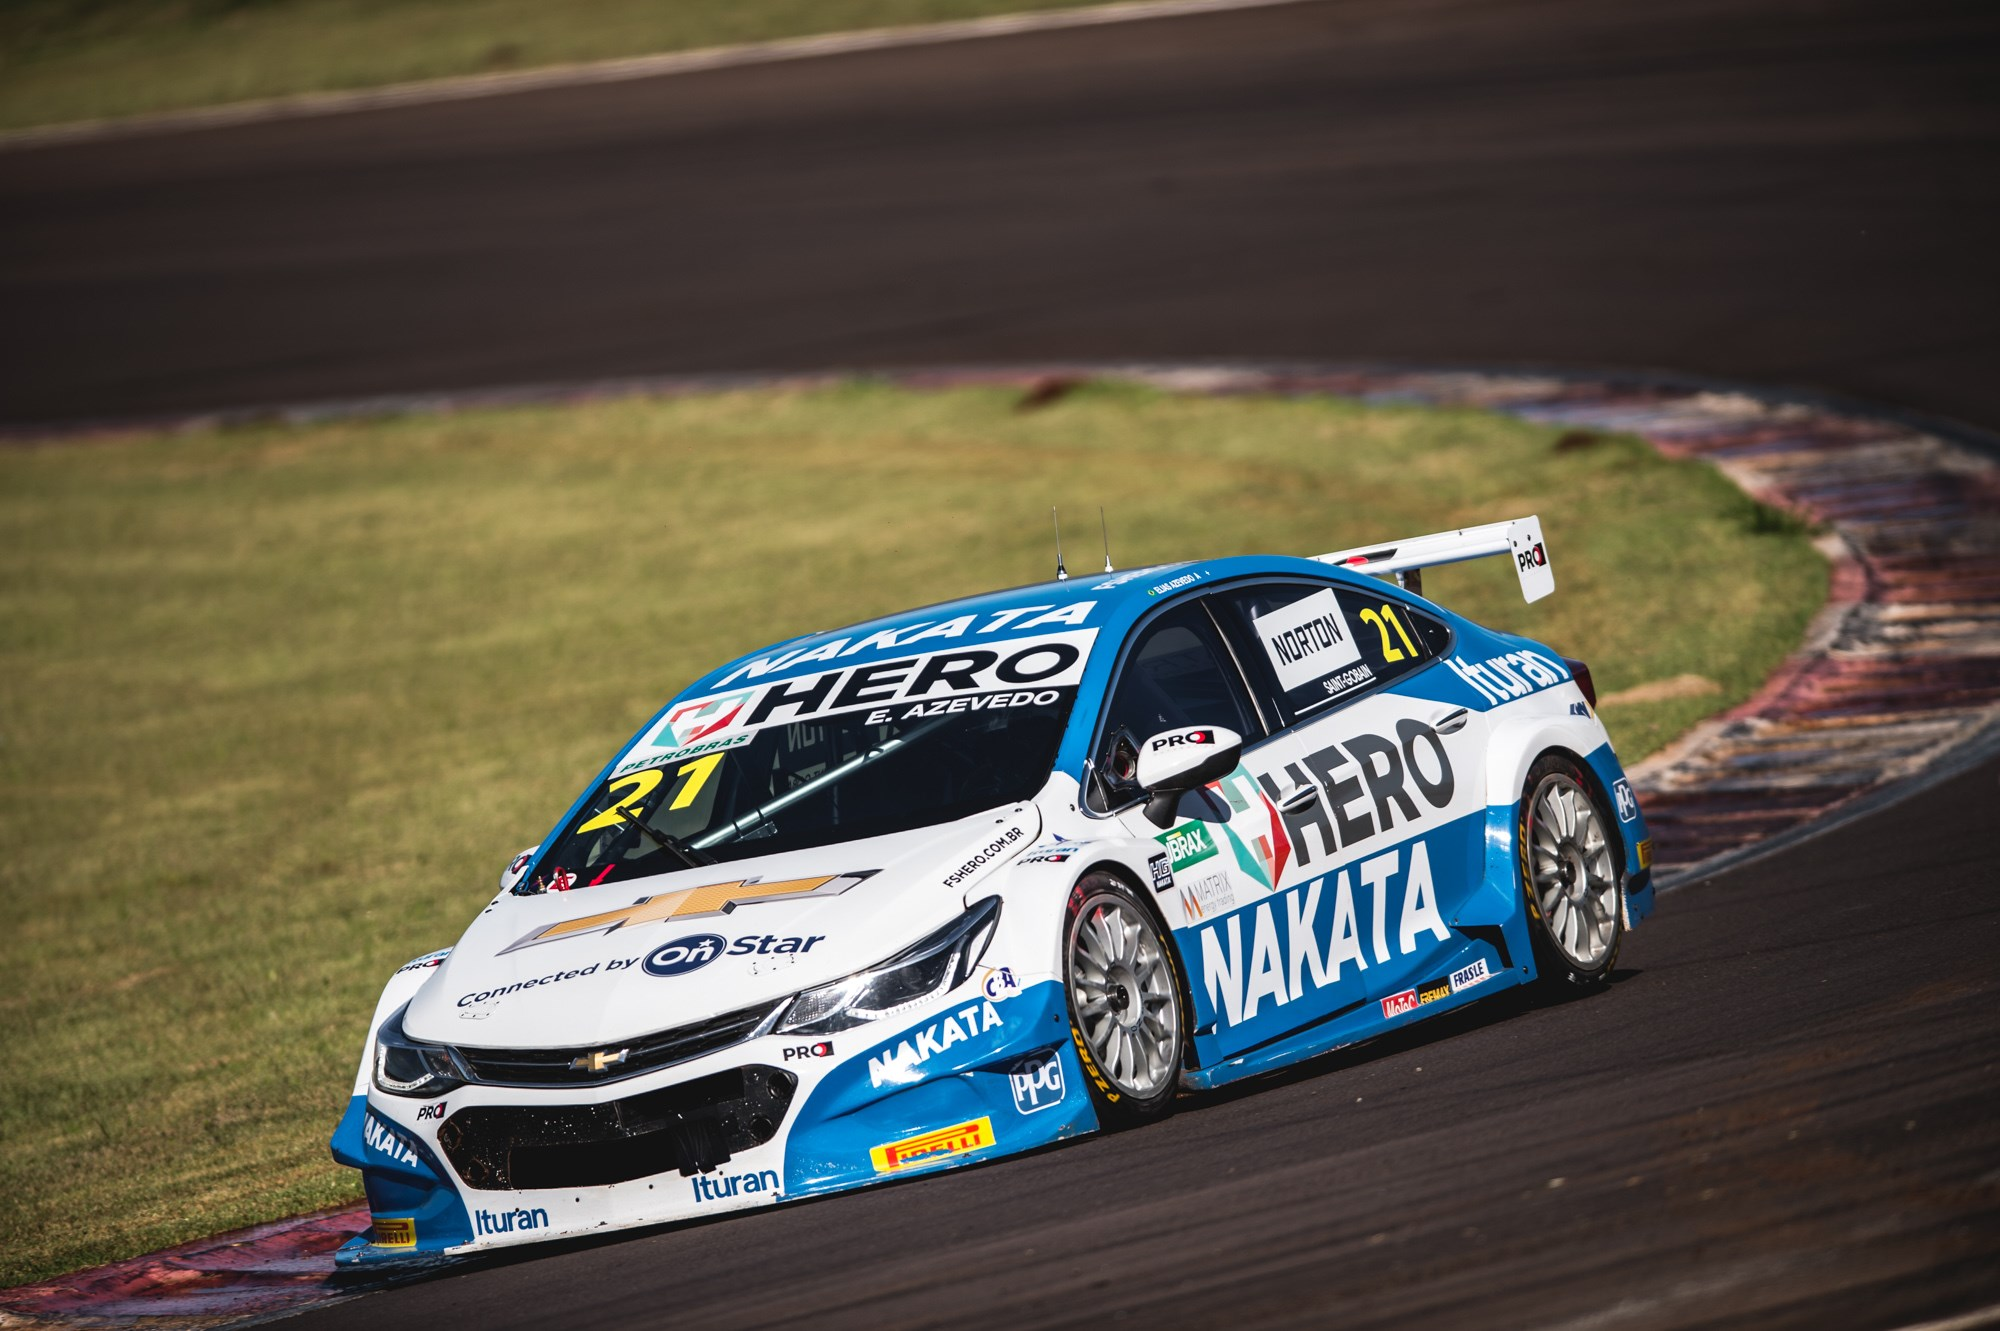 Nonô Figueiredo e Guilherme Salas, pilotos patrocinados pela Nakata, disputam Campeonato Brasileiro de Marcas e Stock Car, neste fim de semana